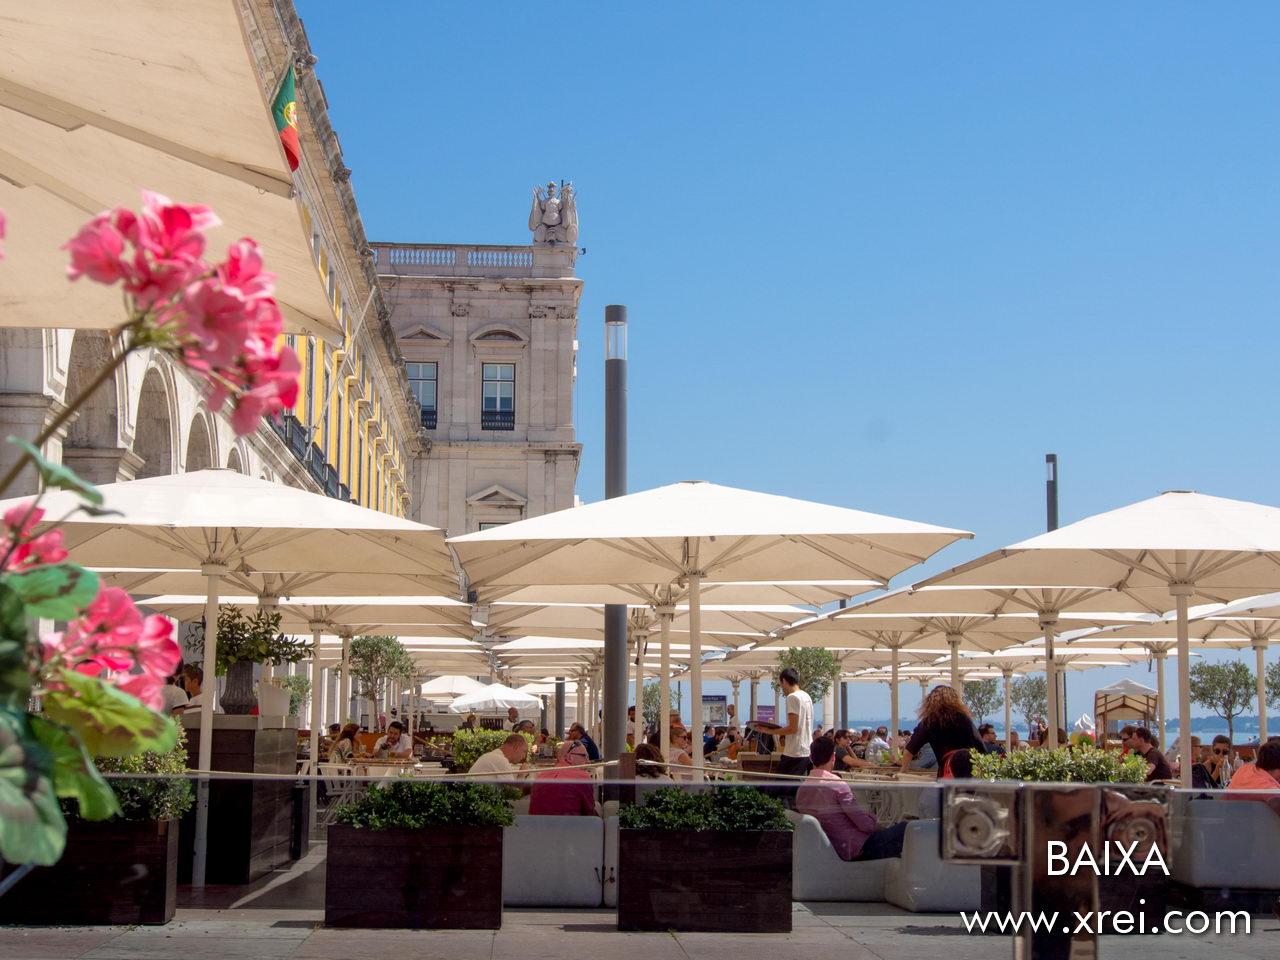 Terraces of Terreiro do Paço restaurants, overlooking the Tagus River